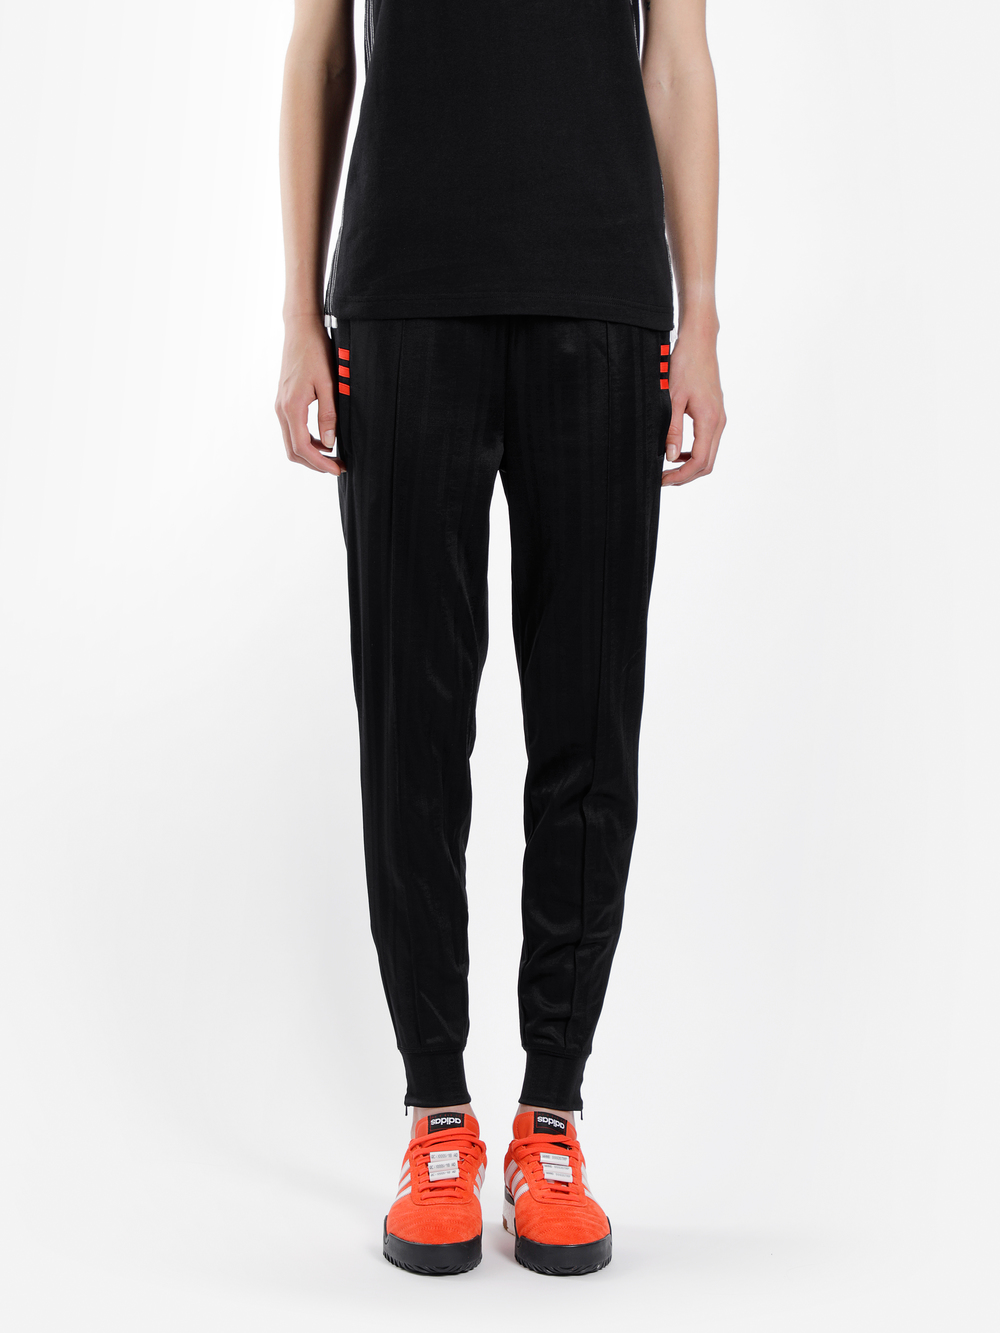 Adidas Originals By Alexander Wang Adidas By Alexander Wang Trousers In Black